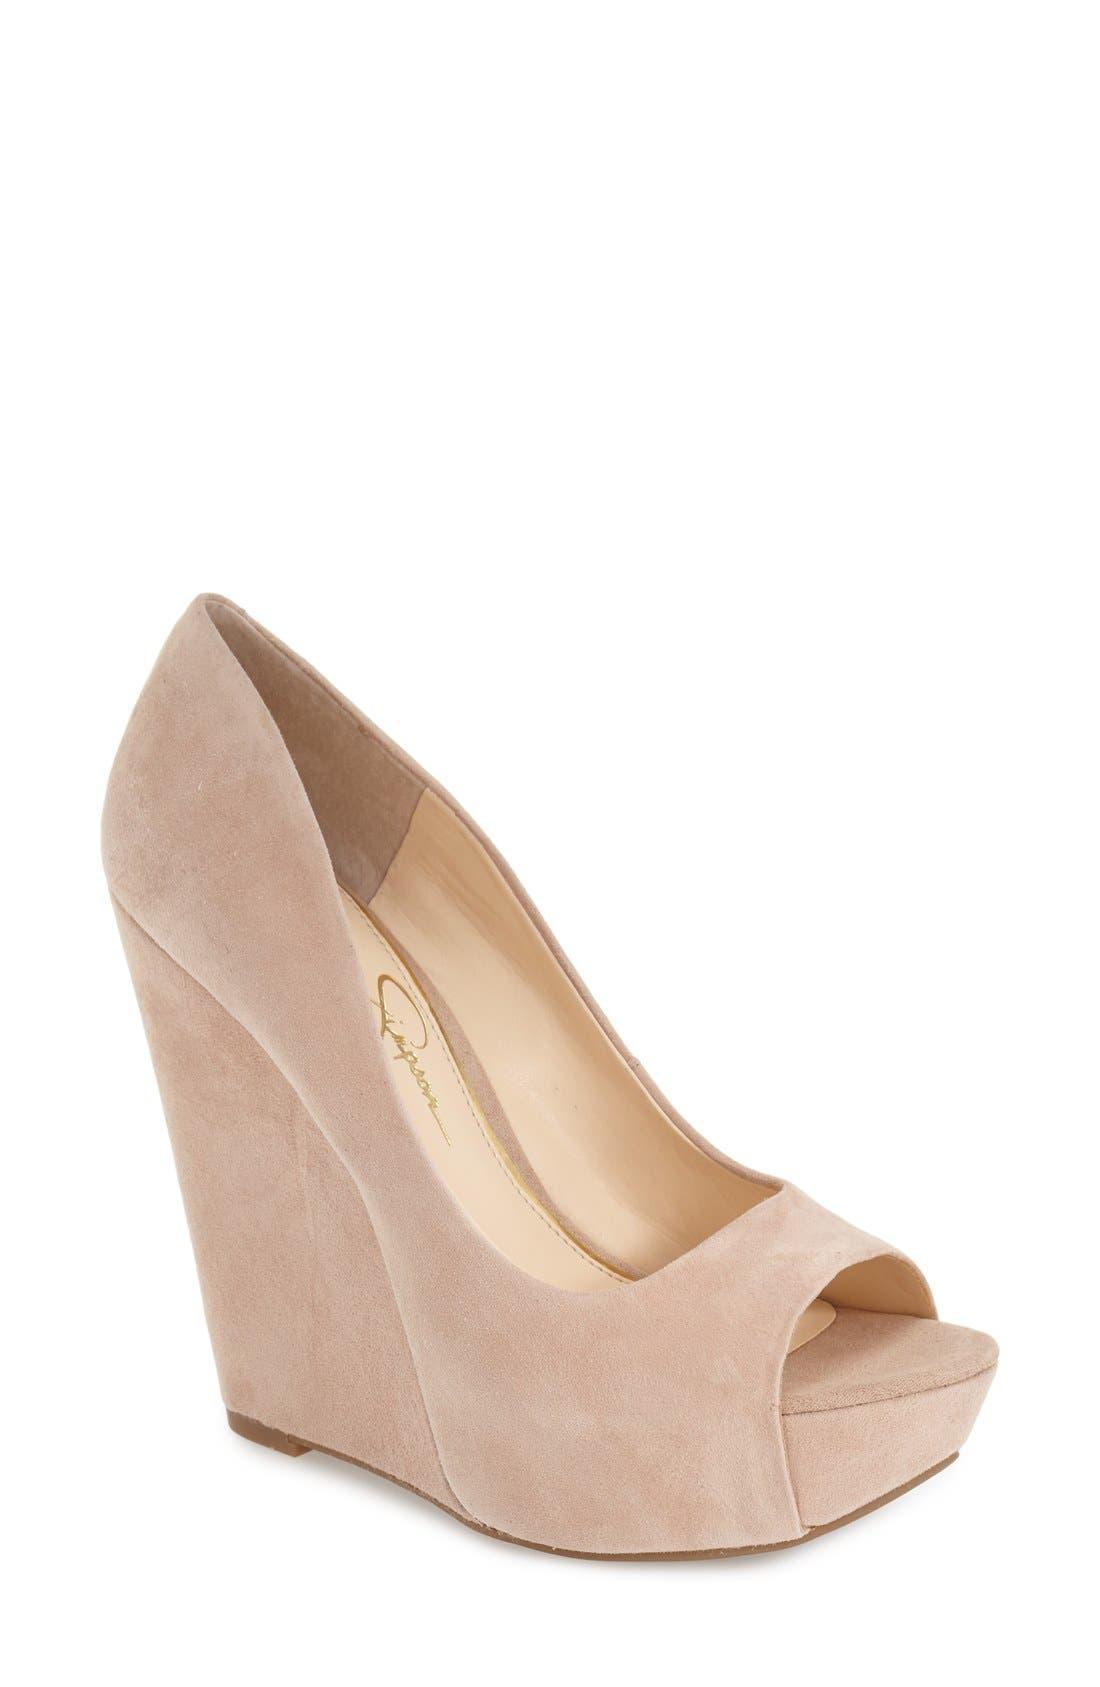 Main Image - Jessica Simpson 'Bethani' Wedge Platform Sandal (Women)